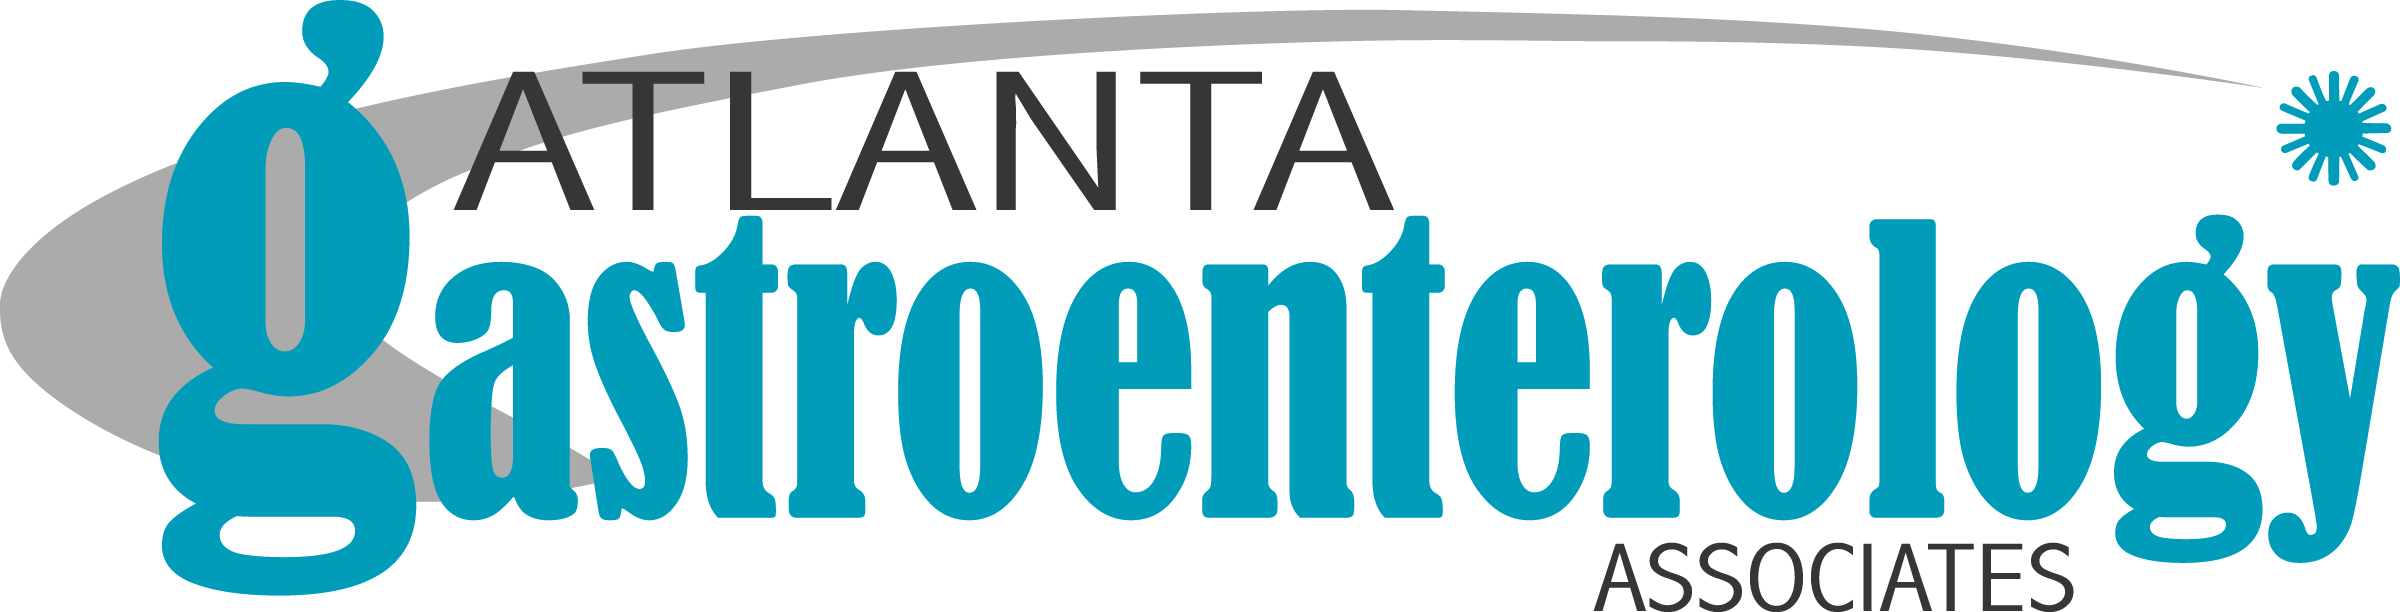 Atlanta Gastroenterology Associates Specialists